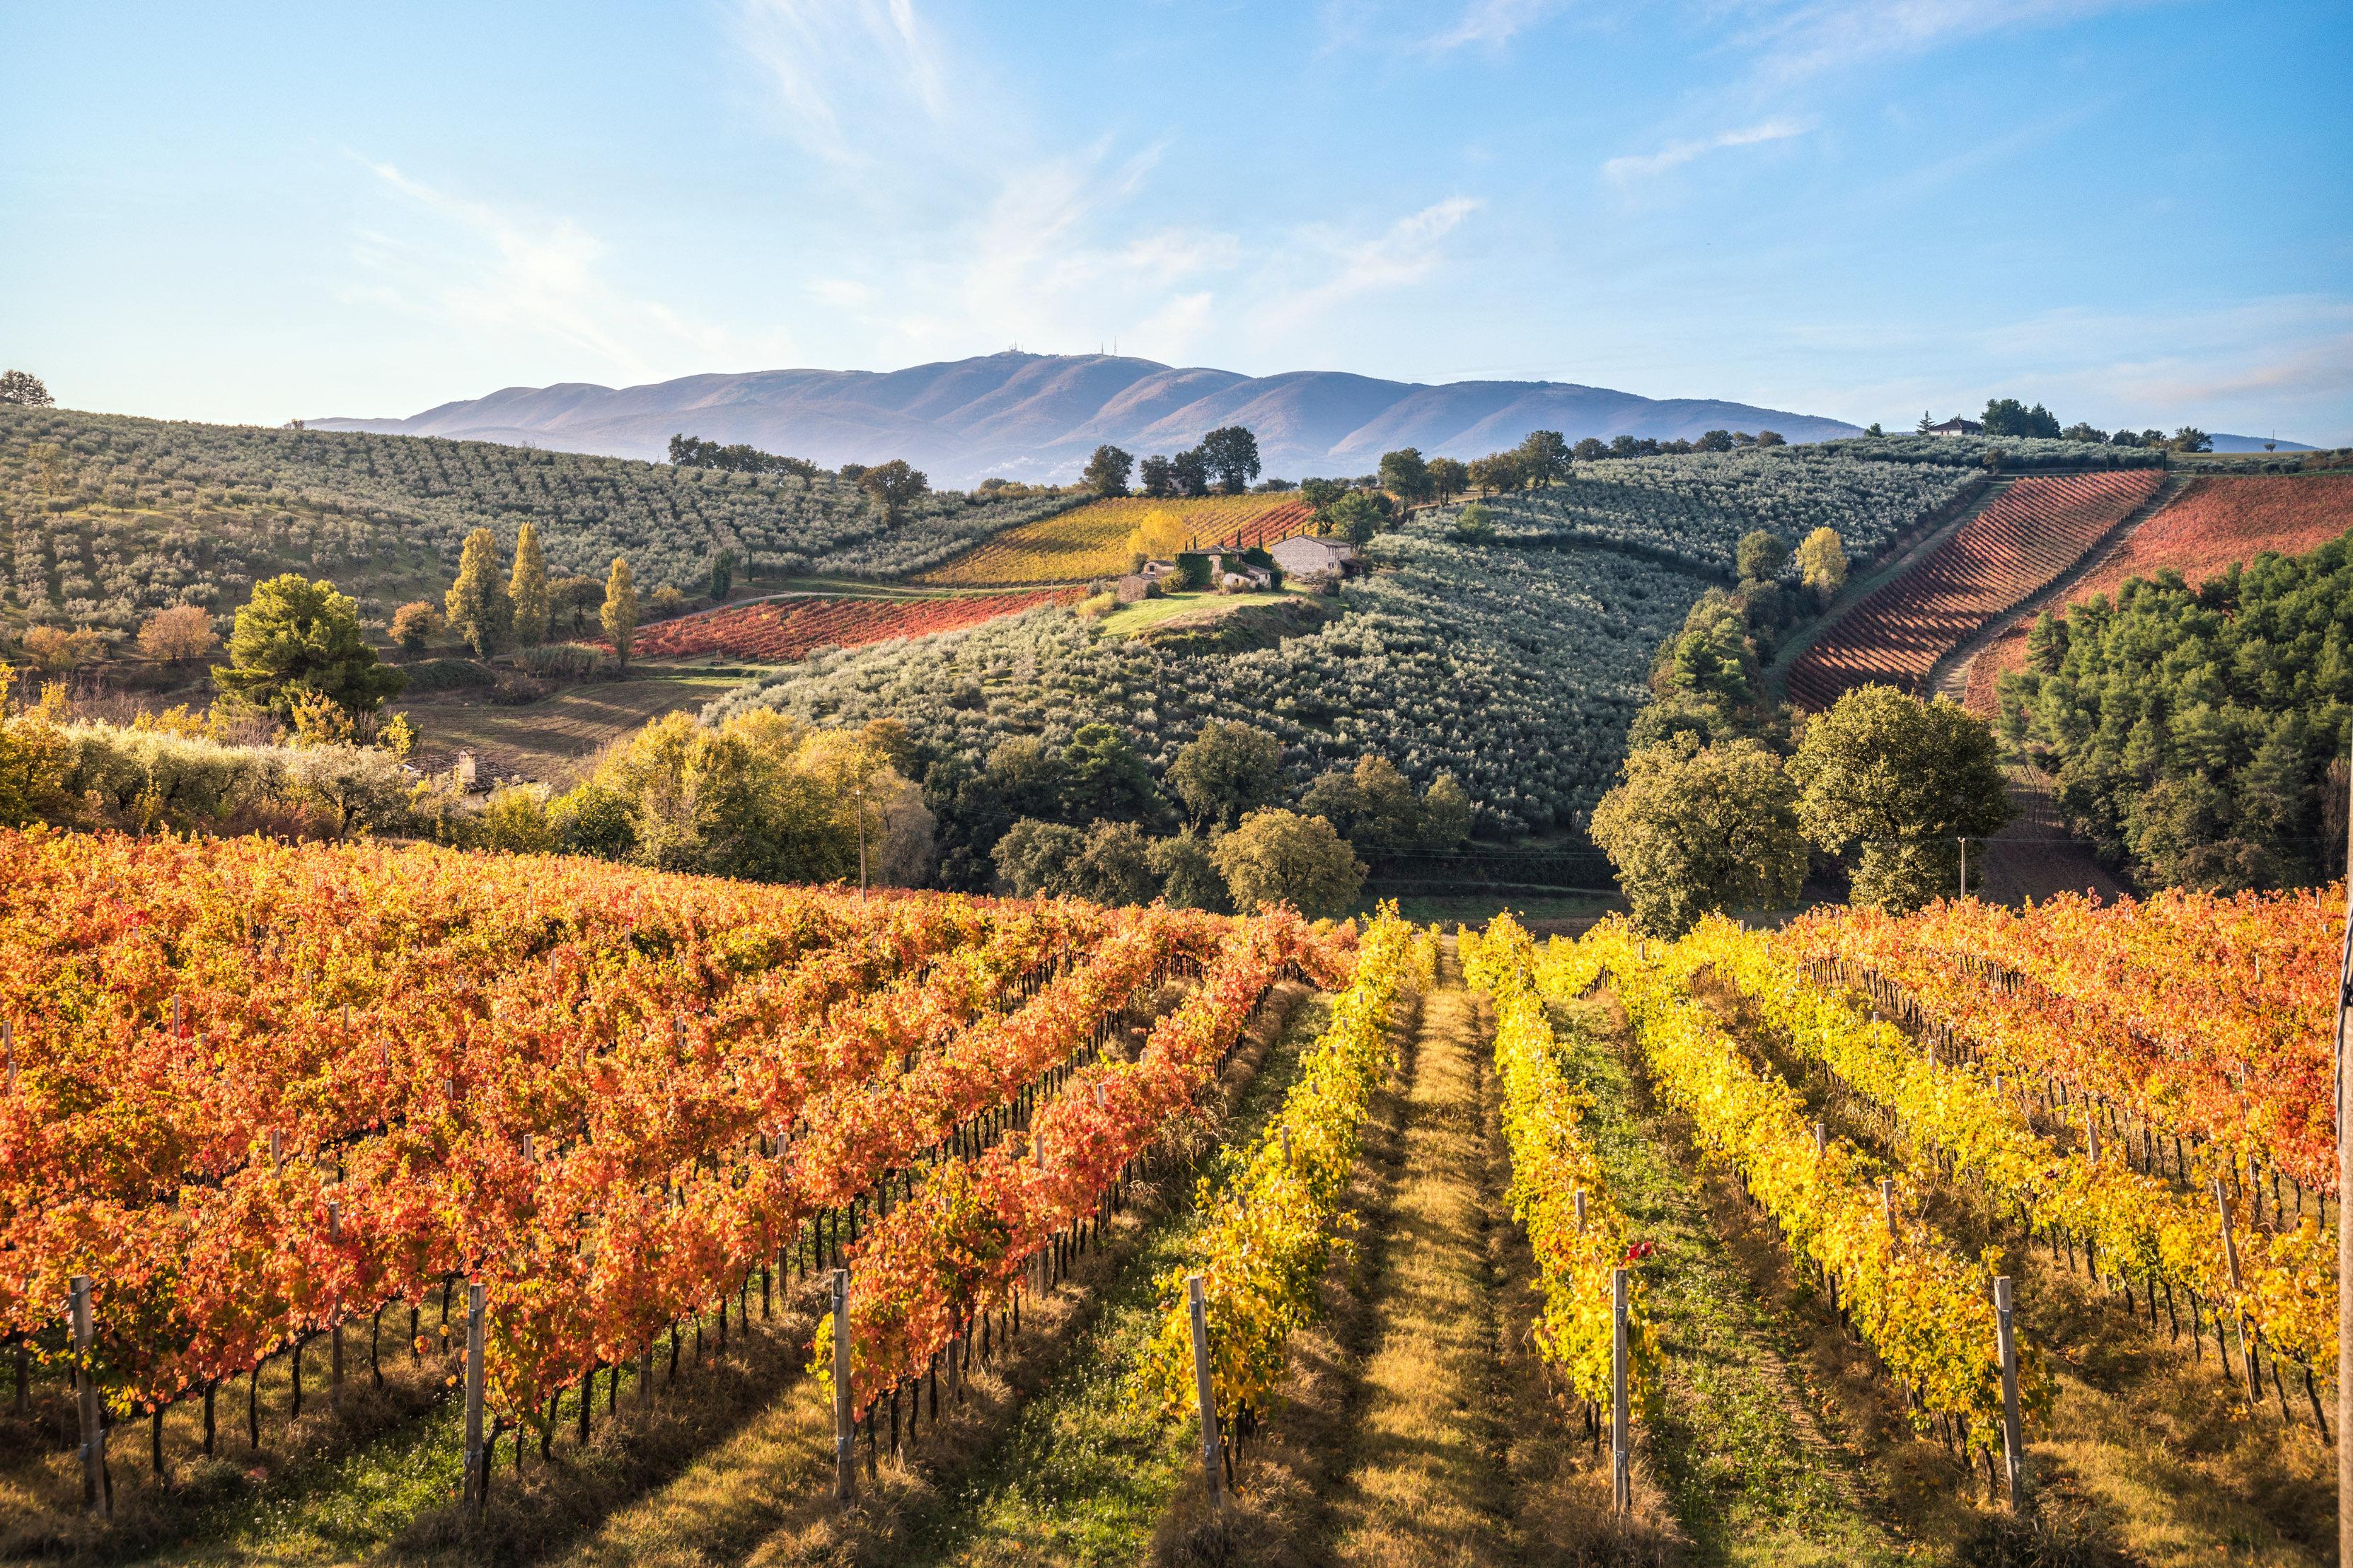 Vineyard in Umbria, Italy